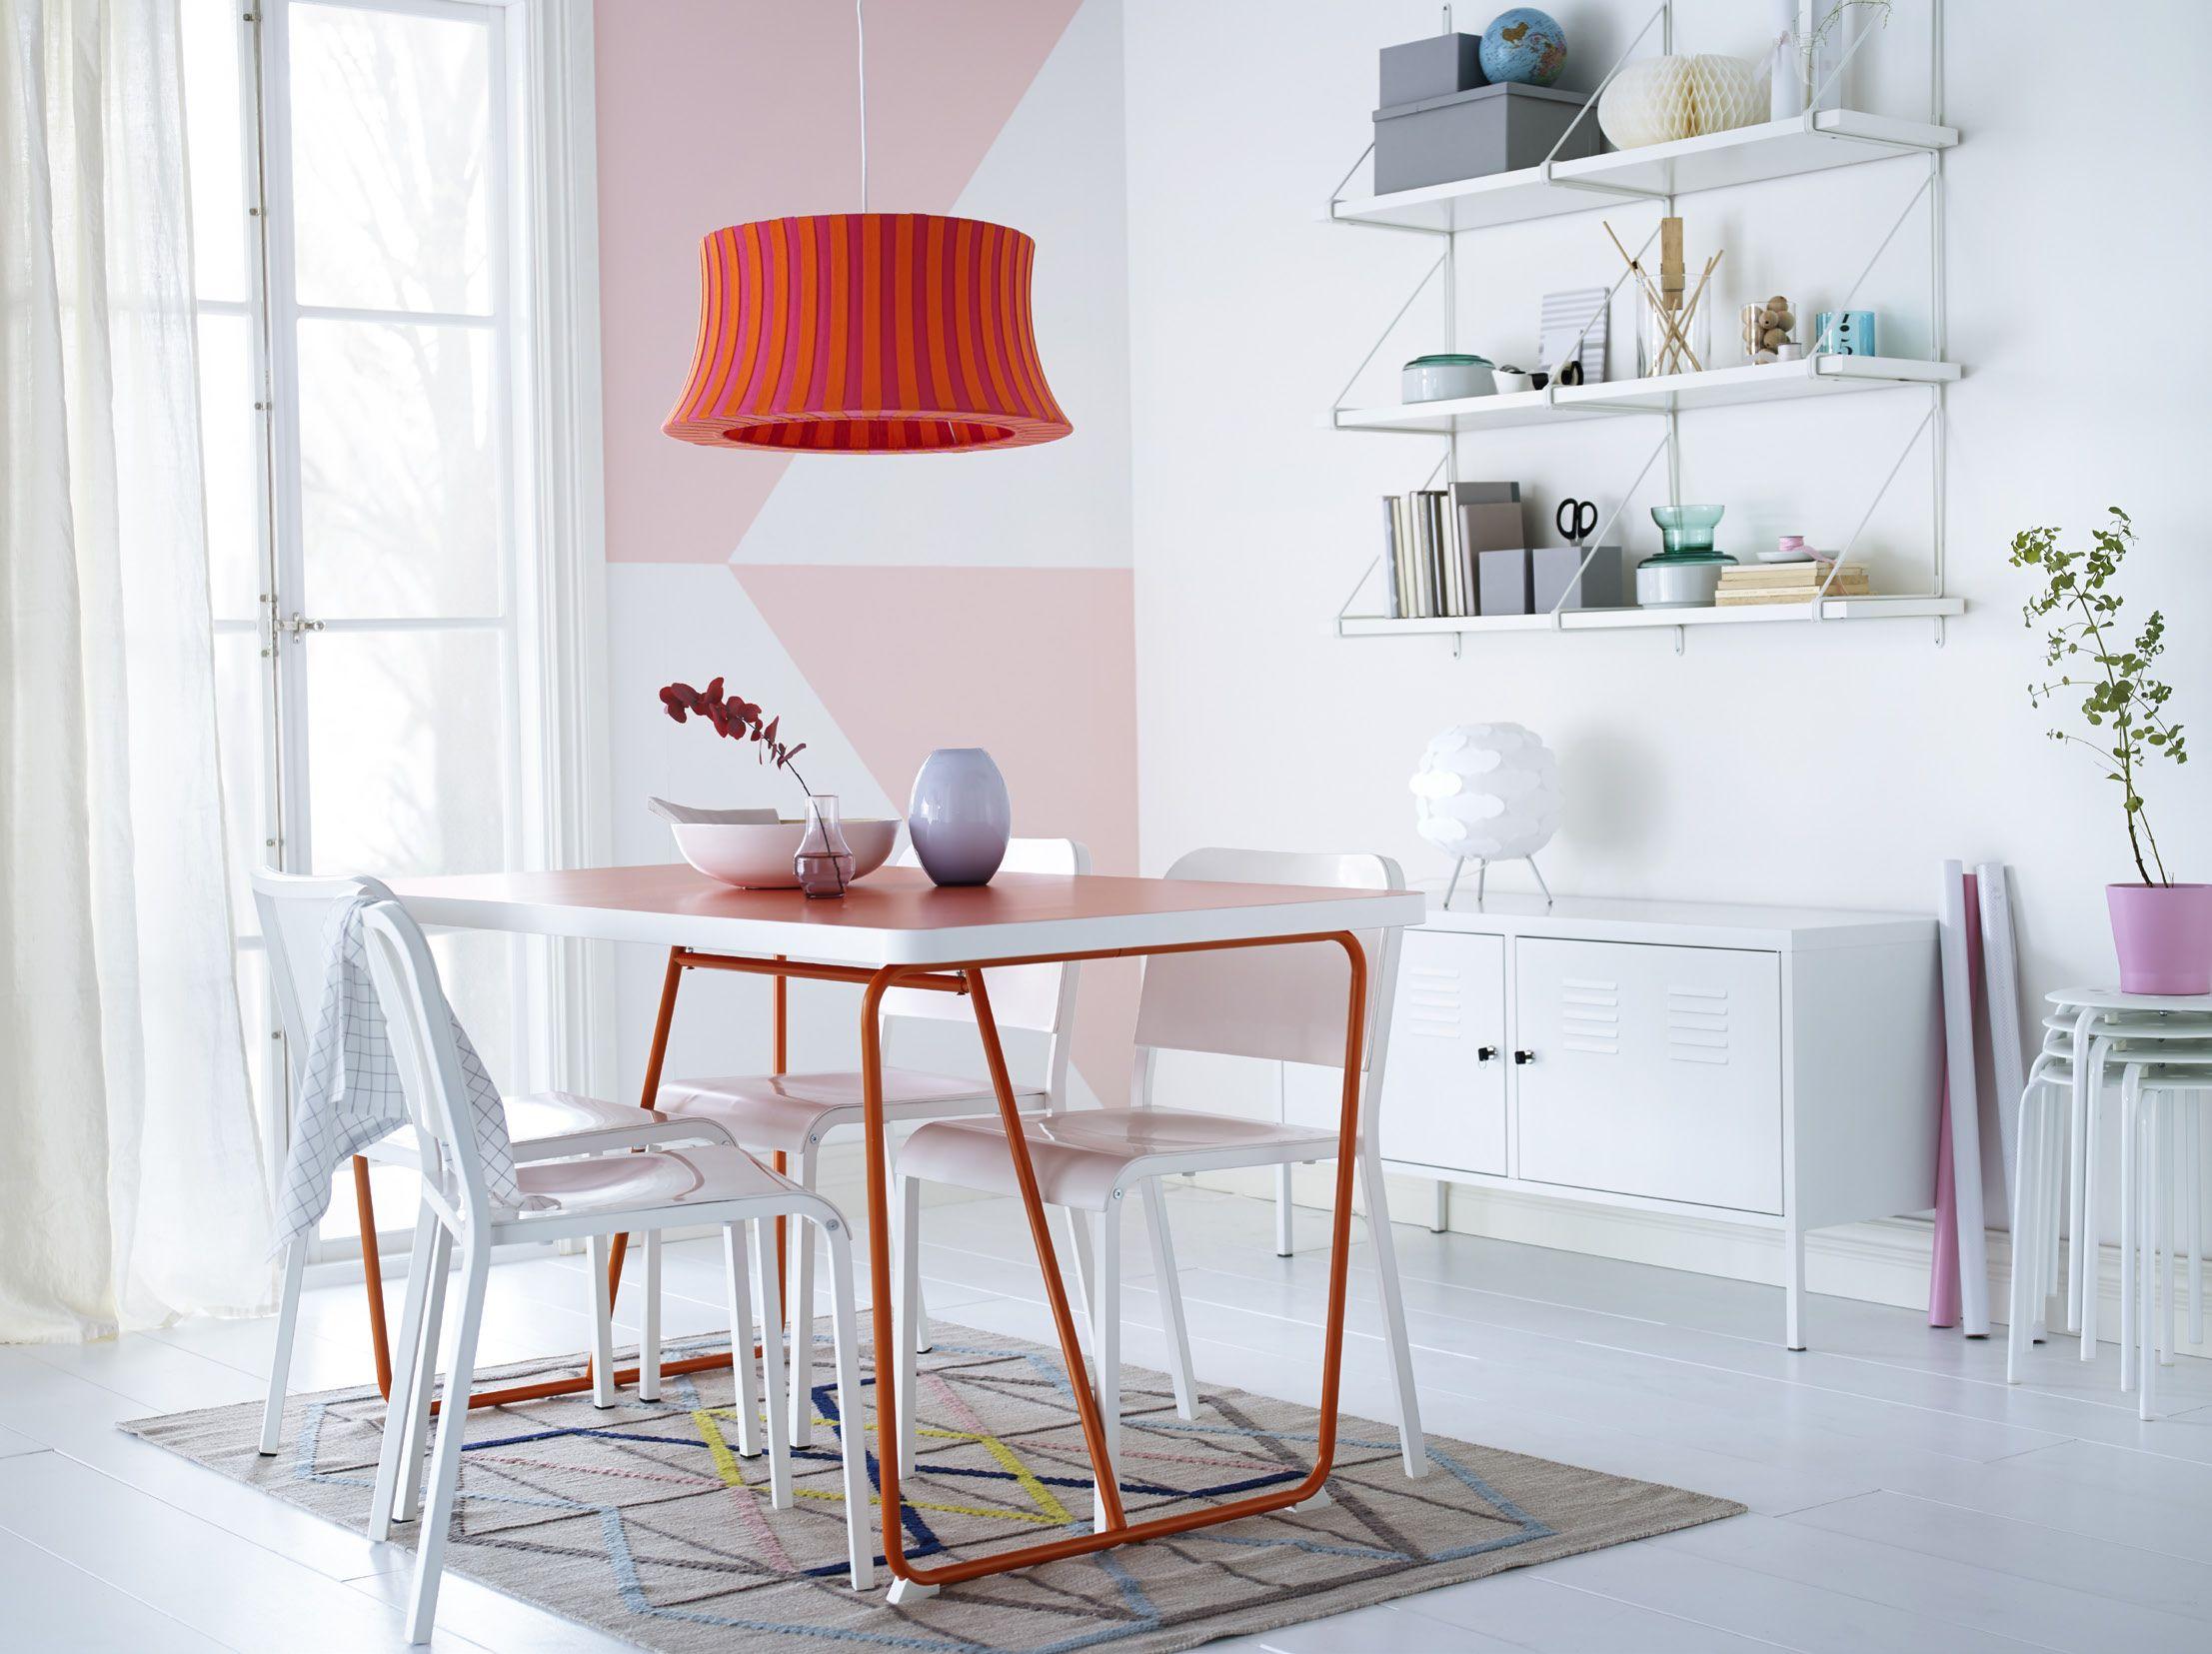 Vuelca en tus paredes toda tu creatividad ideas for Tavoli a consolle allungabili ikea